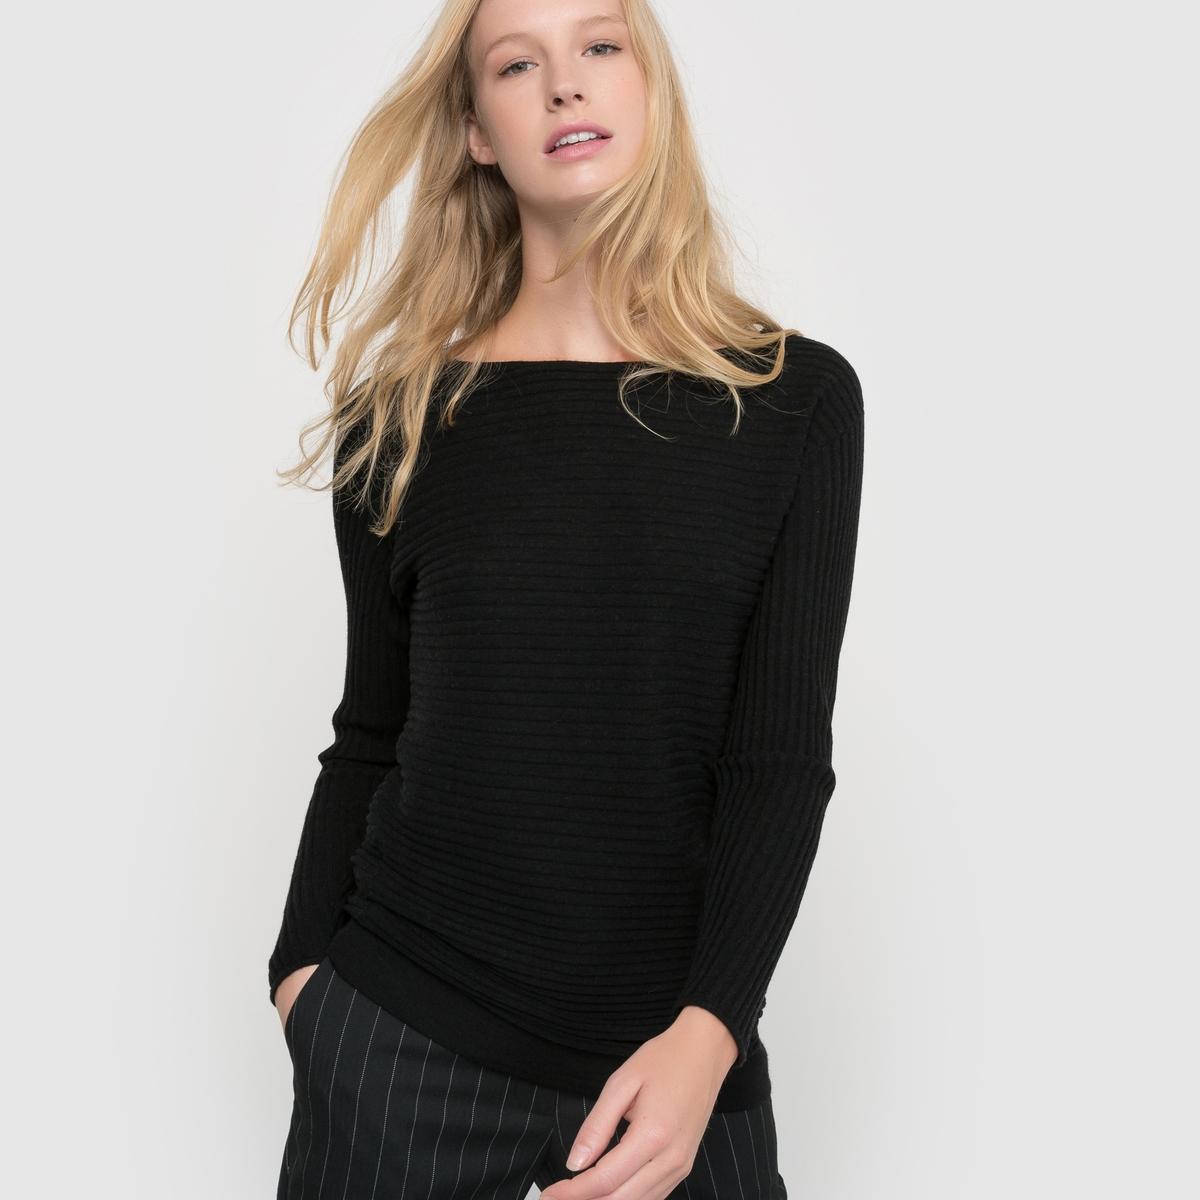 Jersey de pura lana merina, de canalé